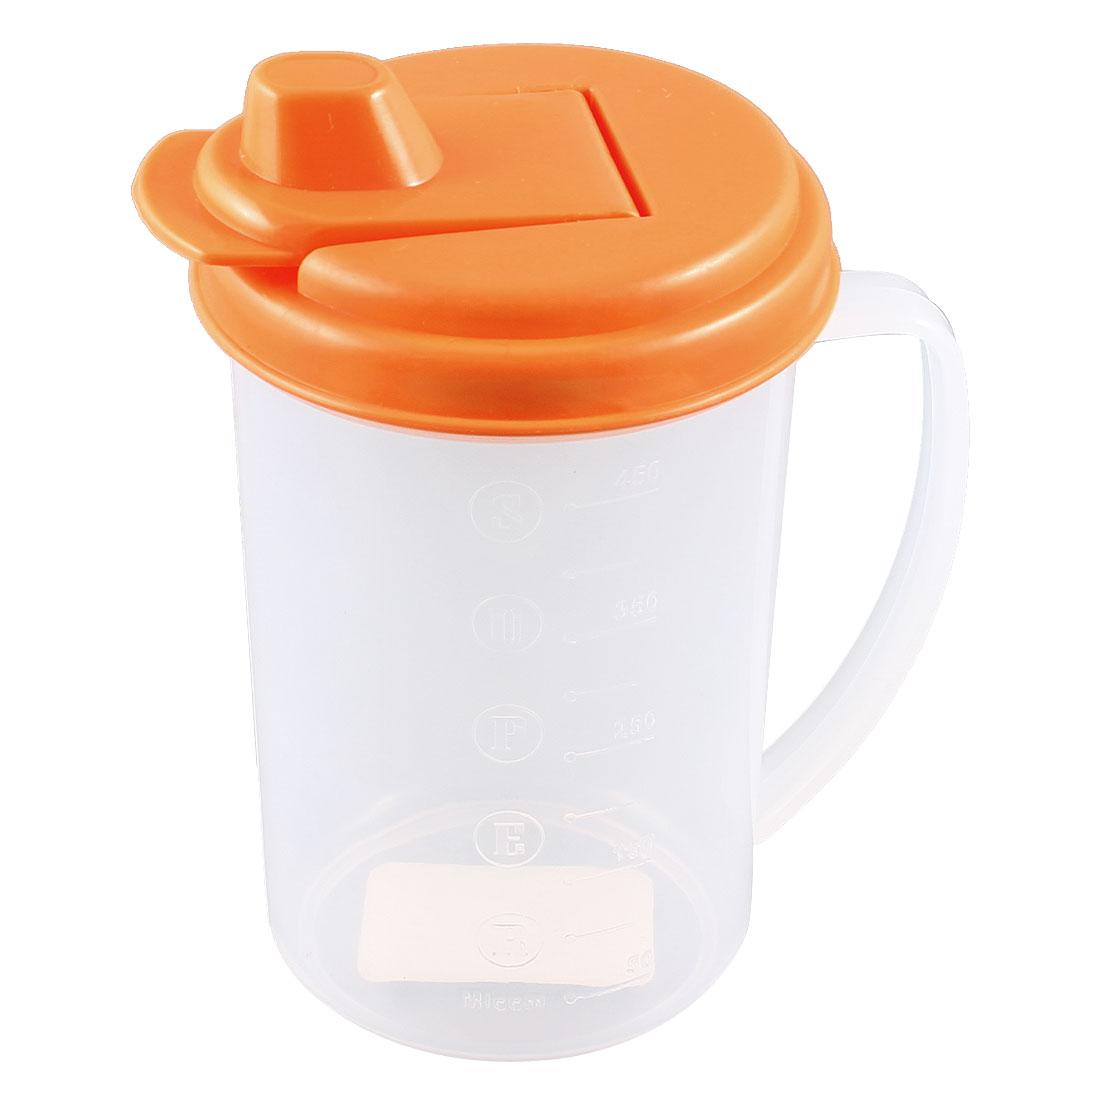 Home Kitchen Orange Top Cap Clear Plastic Oil Vinegar Cruet Bottle 450ml